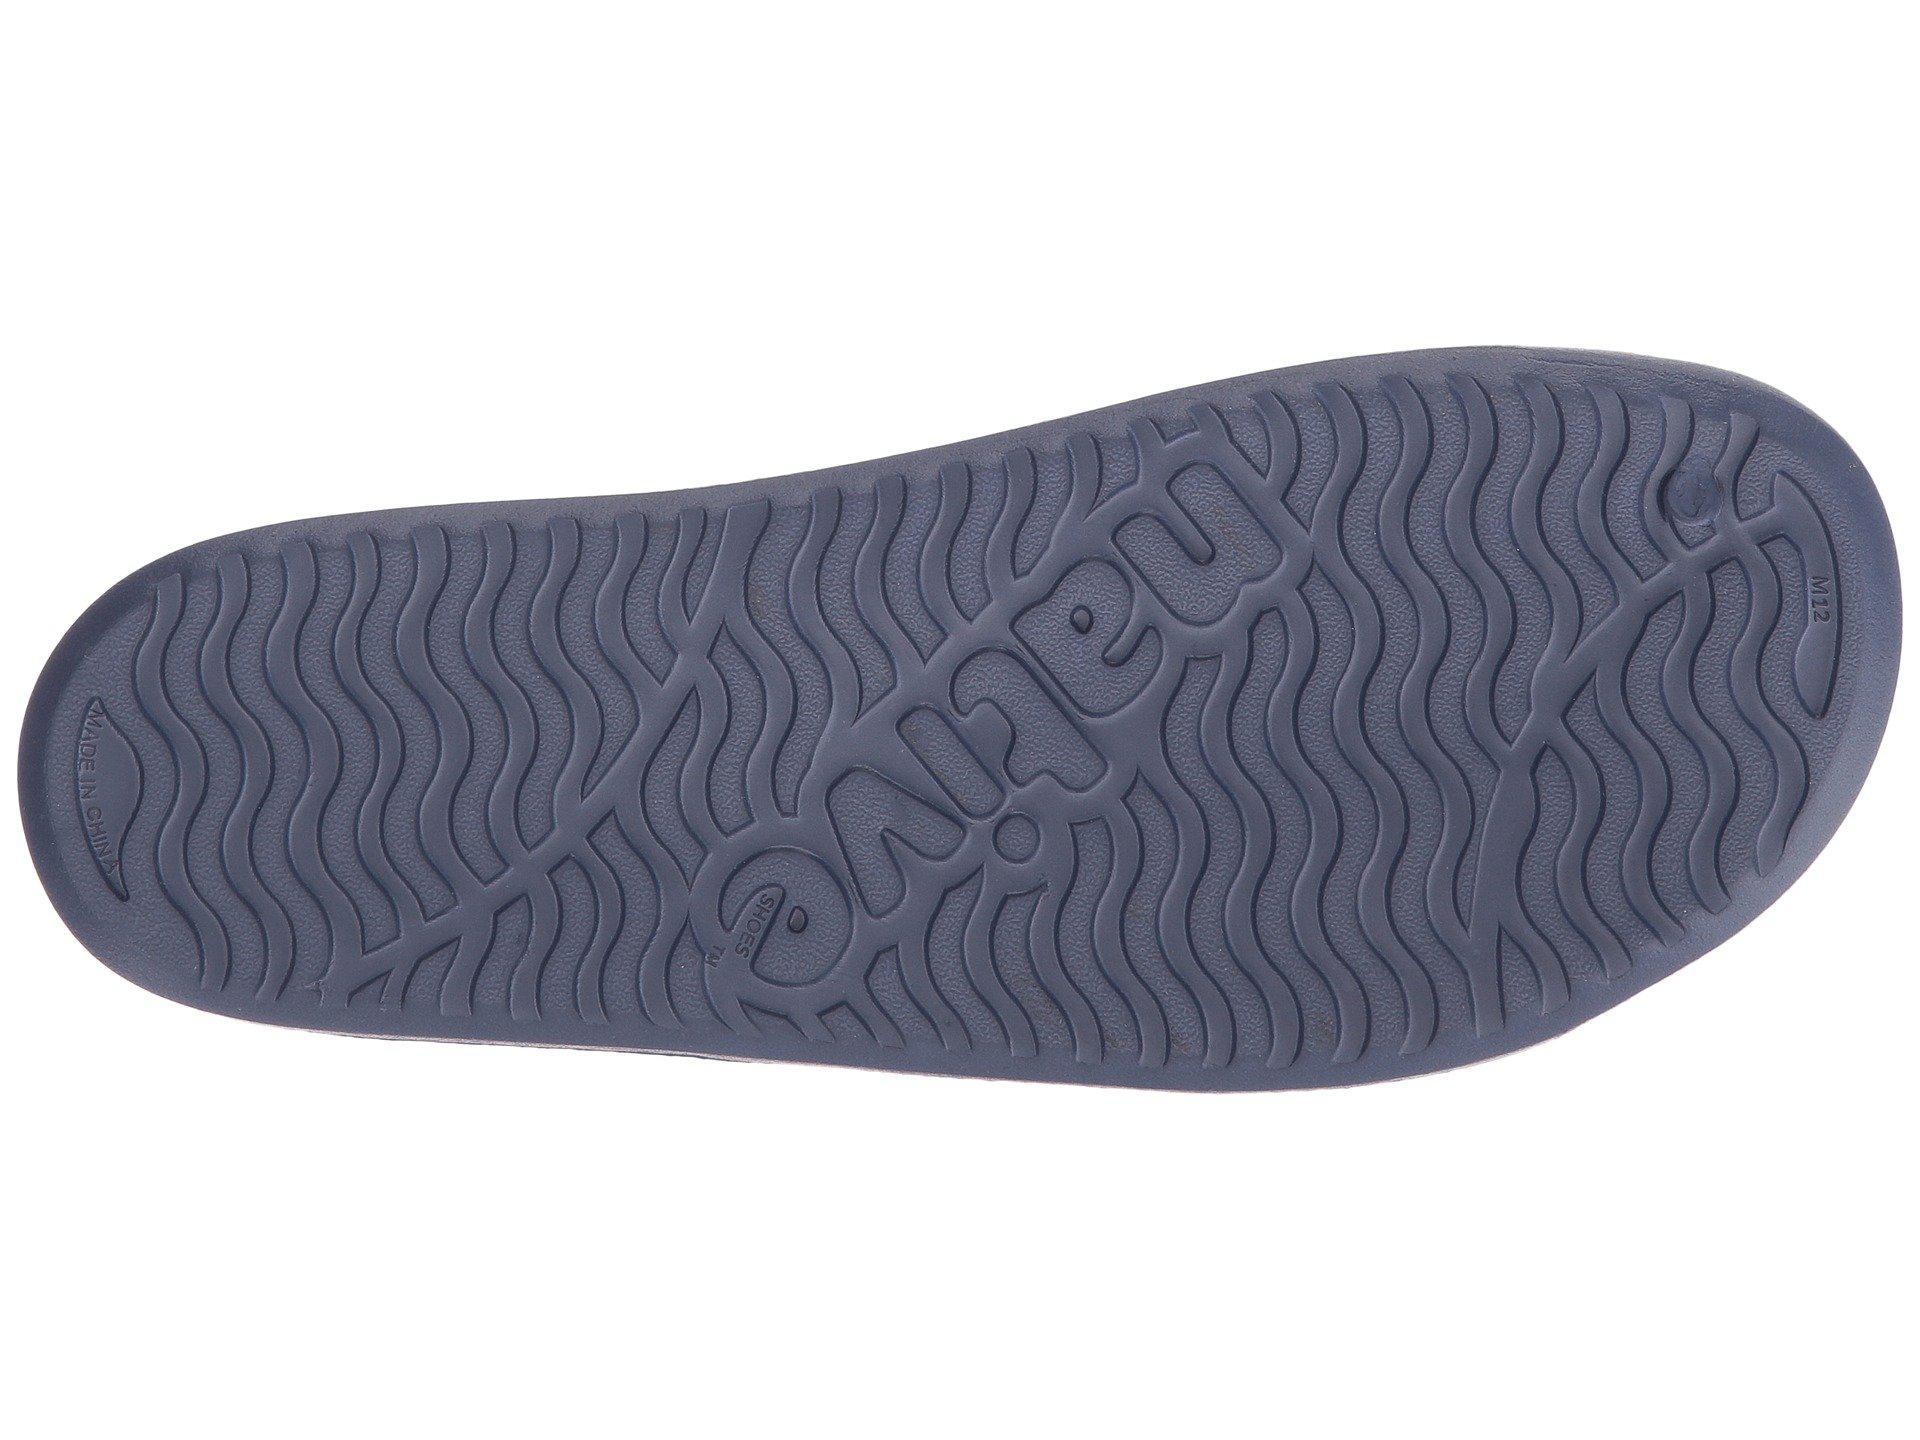 71c6454c745 Native Shoes - Spencer Lx (sherbert Blue lazer Orange) Sandals - Lyst. View  fullscreen